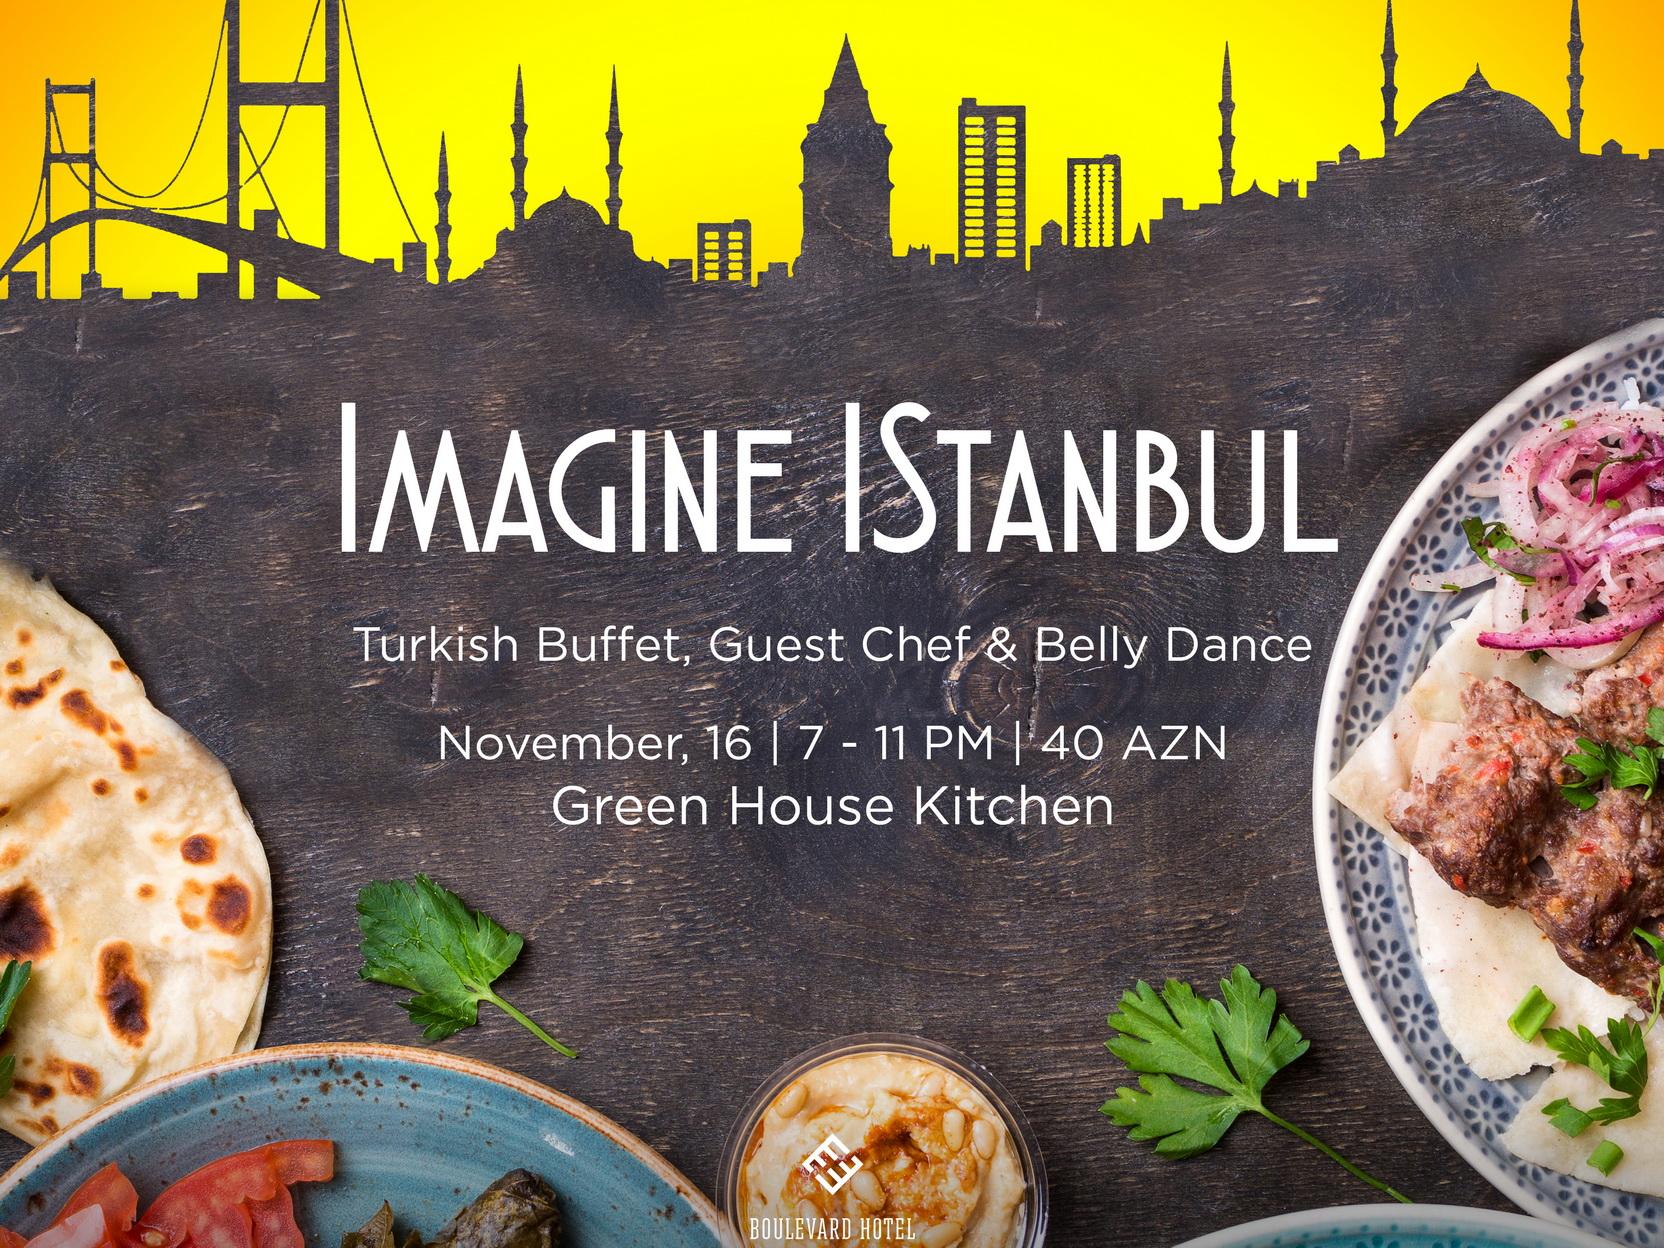 На вечер в Стамбул, не покидая Баку – ФОТО